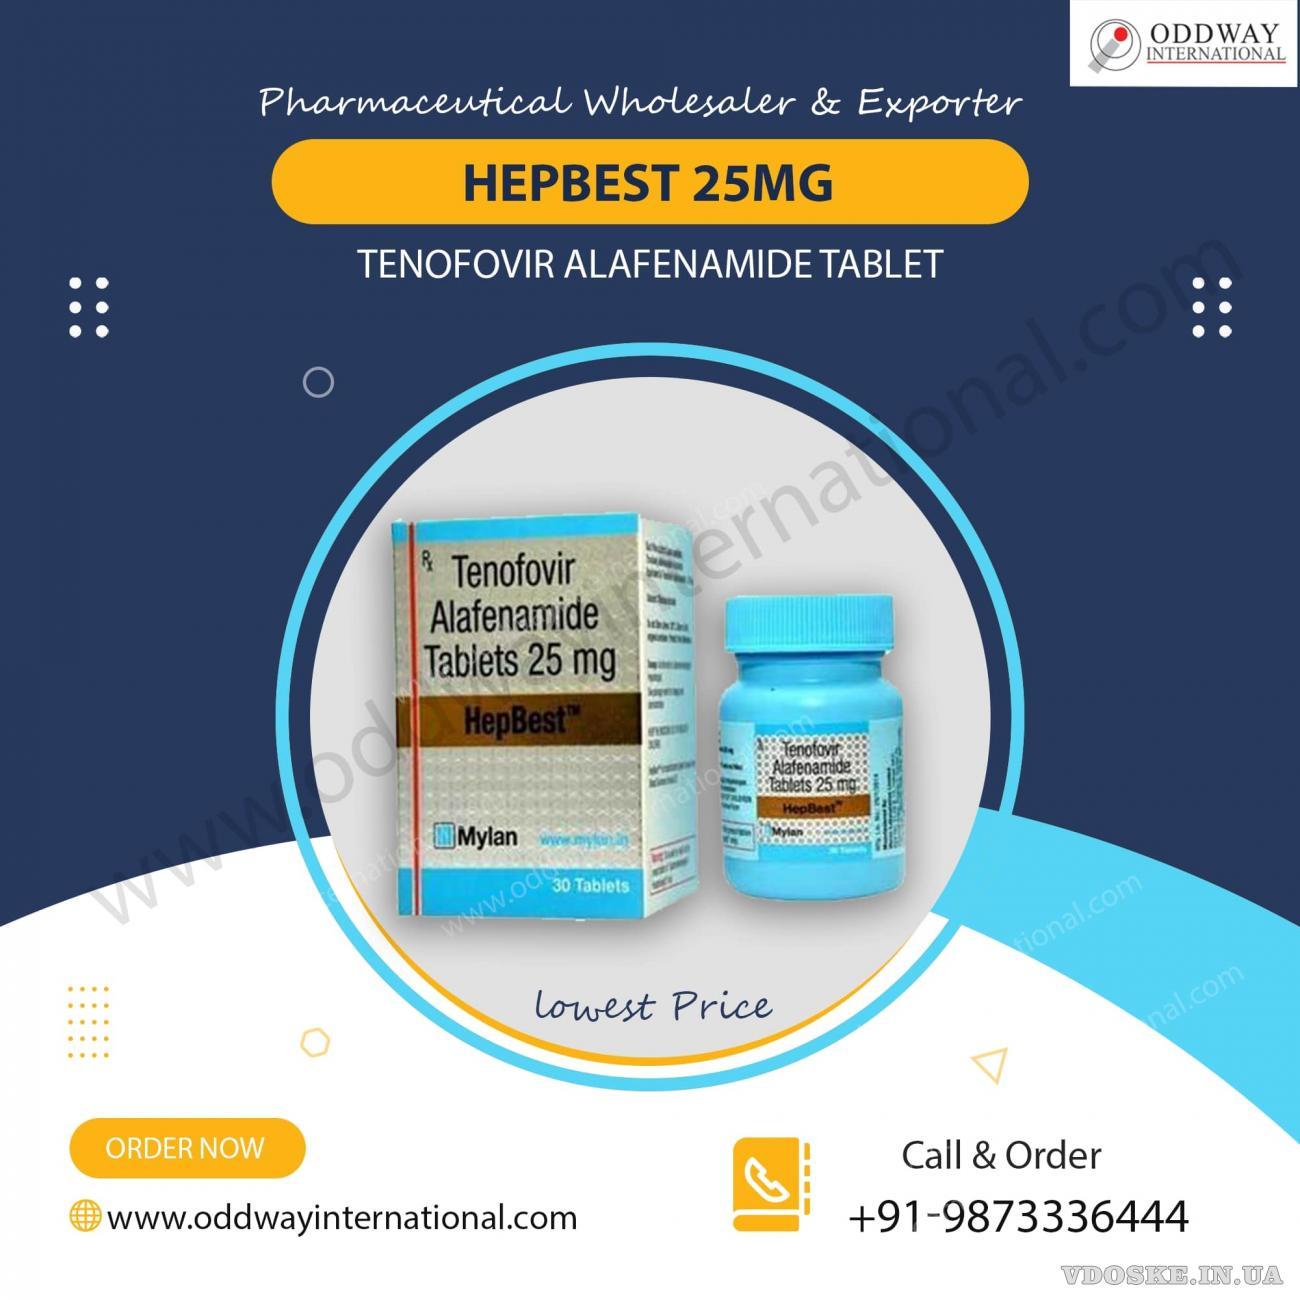 Mylan HepBest 25 мг таблетка тенофовира алафенамида по самой низкой цене